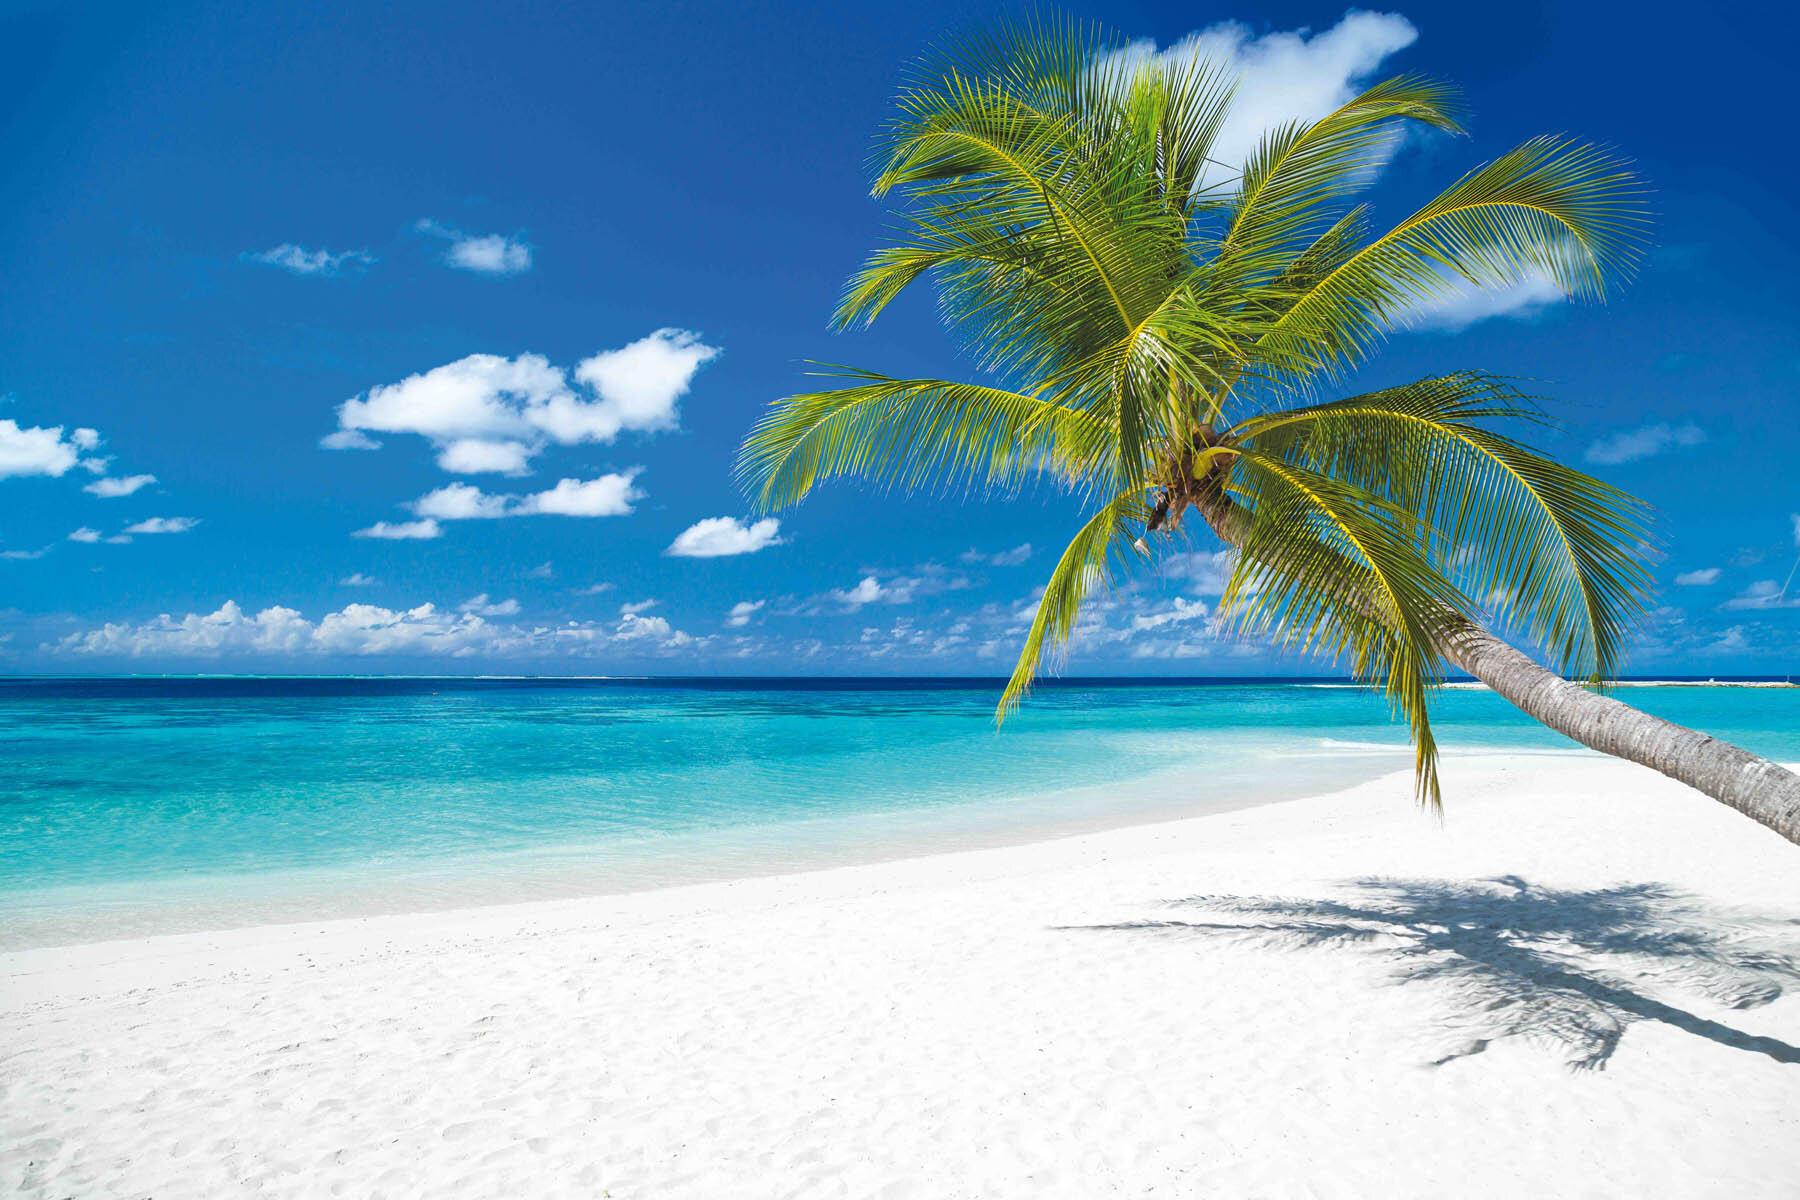 PlateART Duschrückwand mit Motiv Strand und Meer Karibik Palme